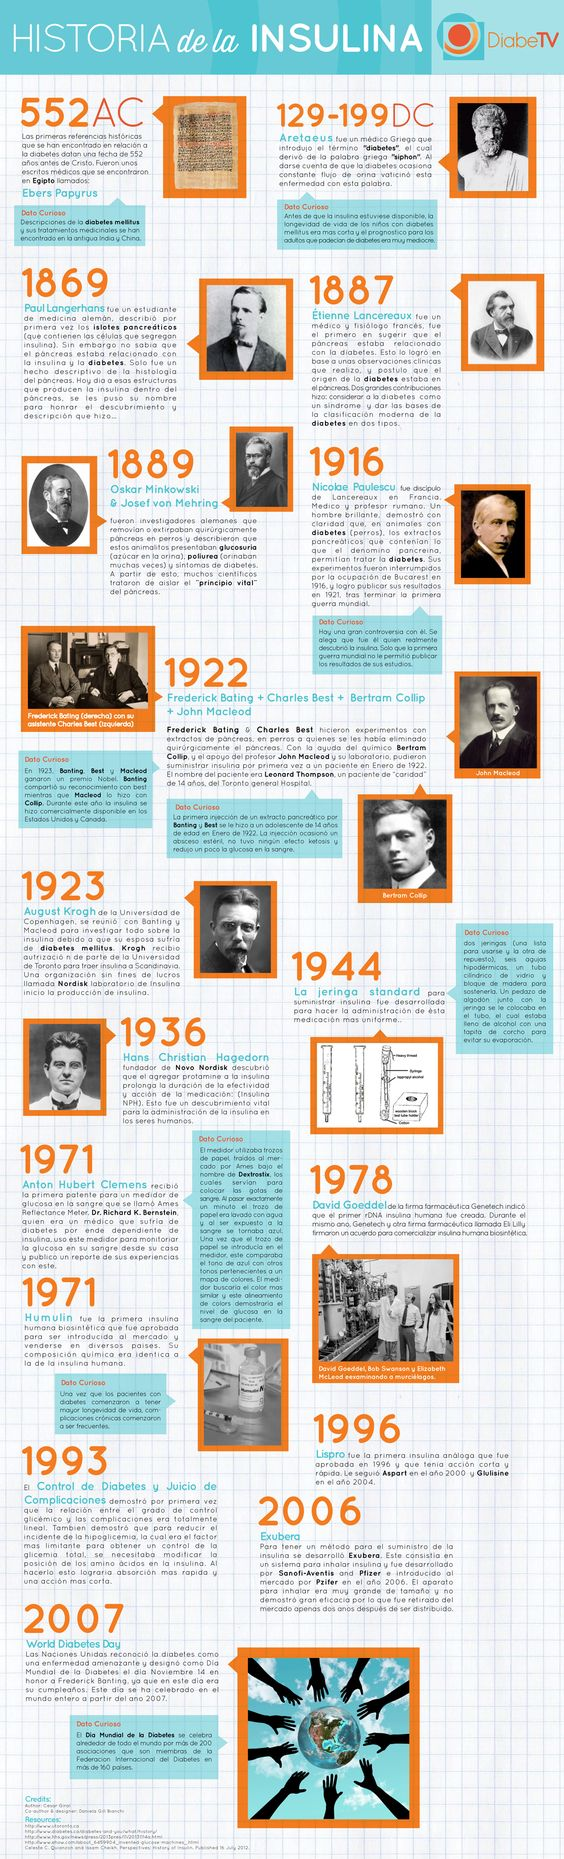 Historia de la insulina | DIABETES MELLITUS TIPO 1